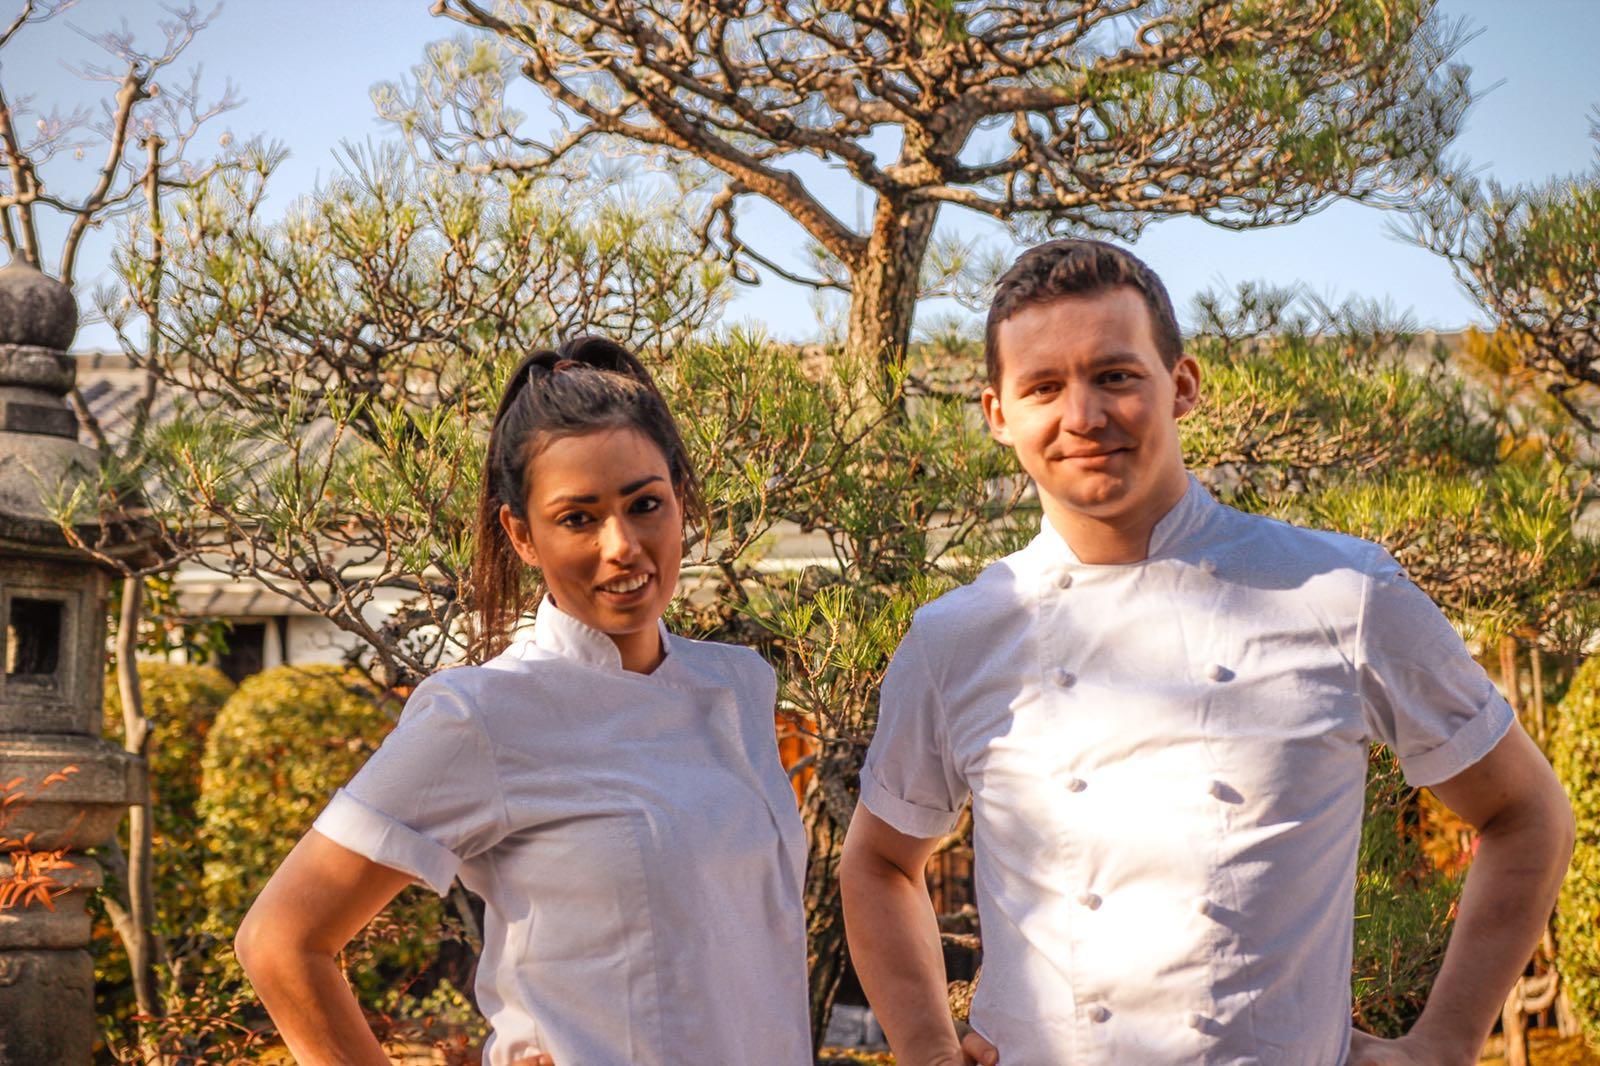 Chef Krzysztof Czerwinski (LONDON) & Wallace Lau (HONG KONG) the Mixologist - Test Kitchen